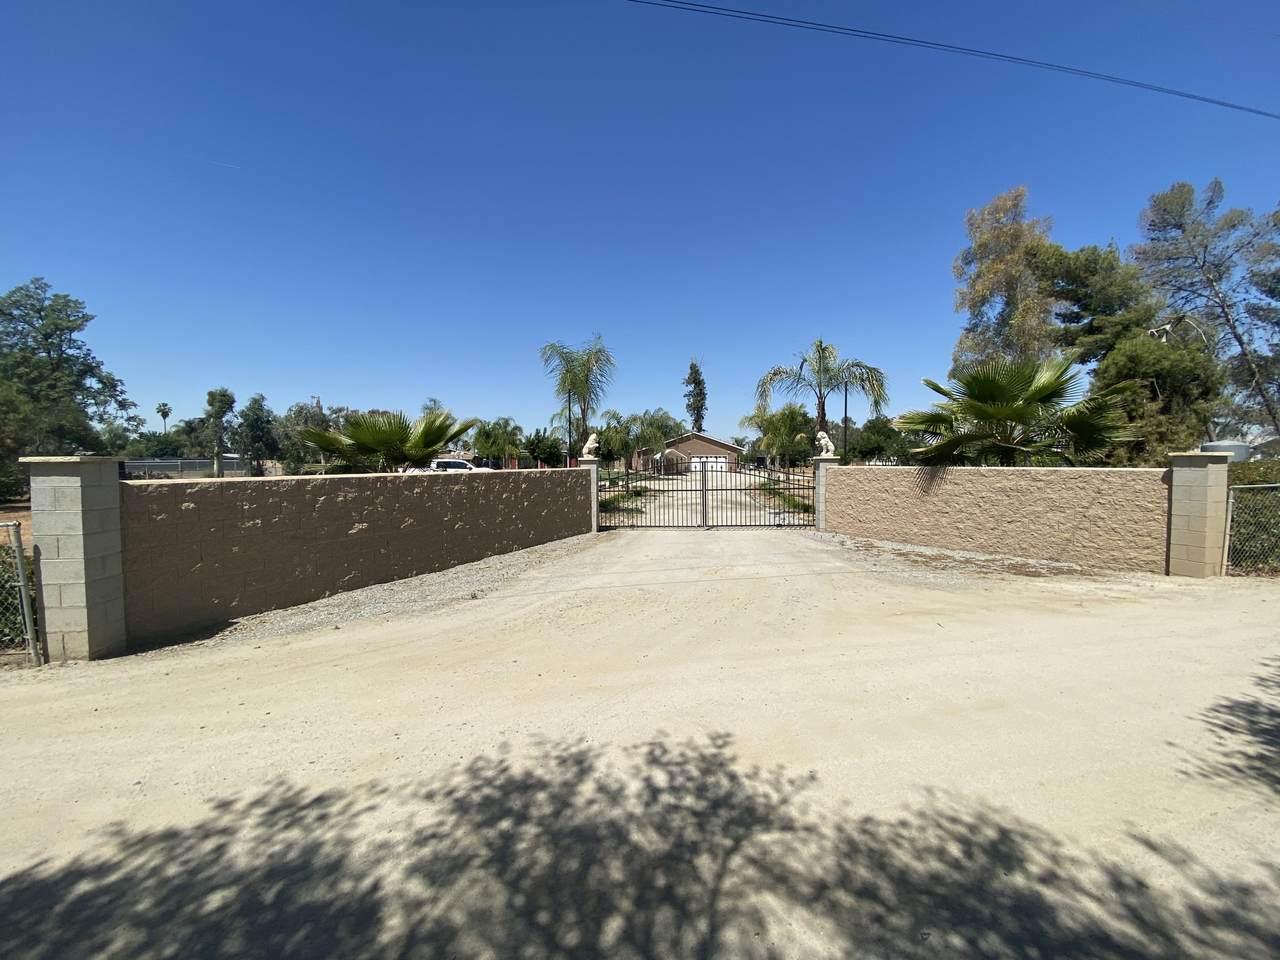 14194 Ave 328 - Photo 1